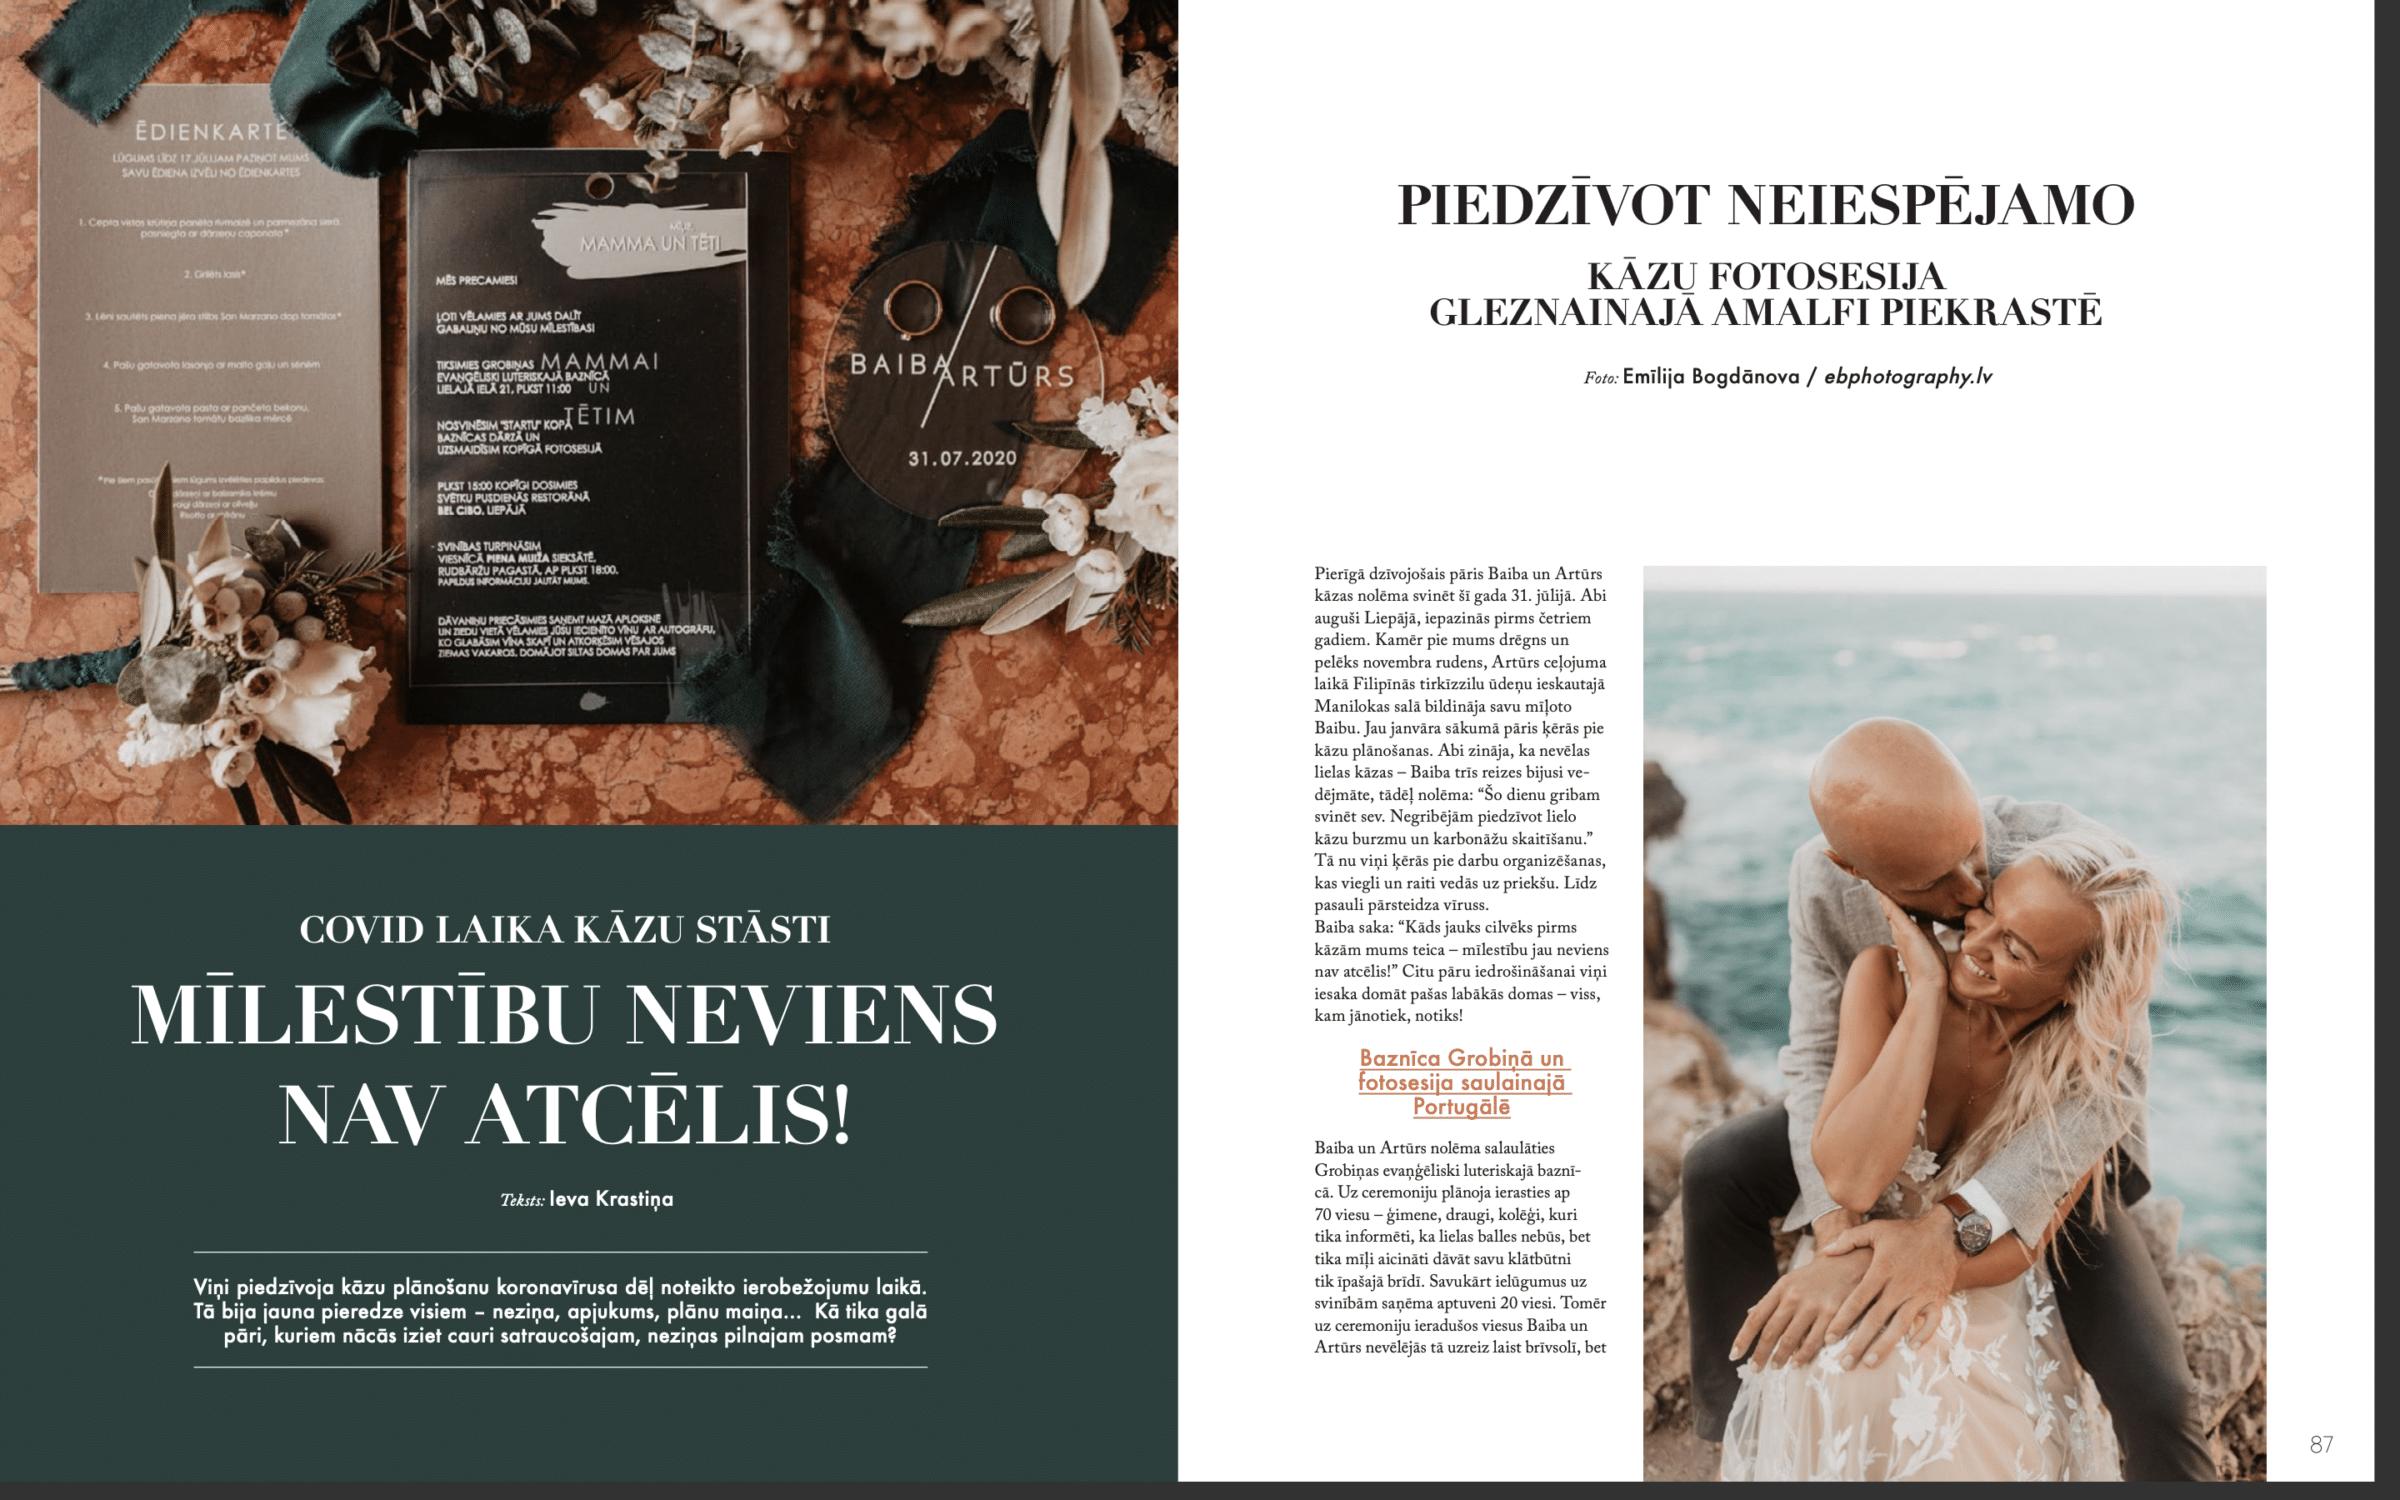 Wedding Story of Amelii Bride in LĪGAVĀM Magazine issue No. 9